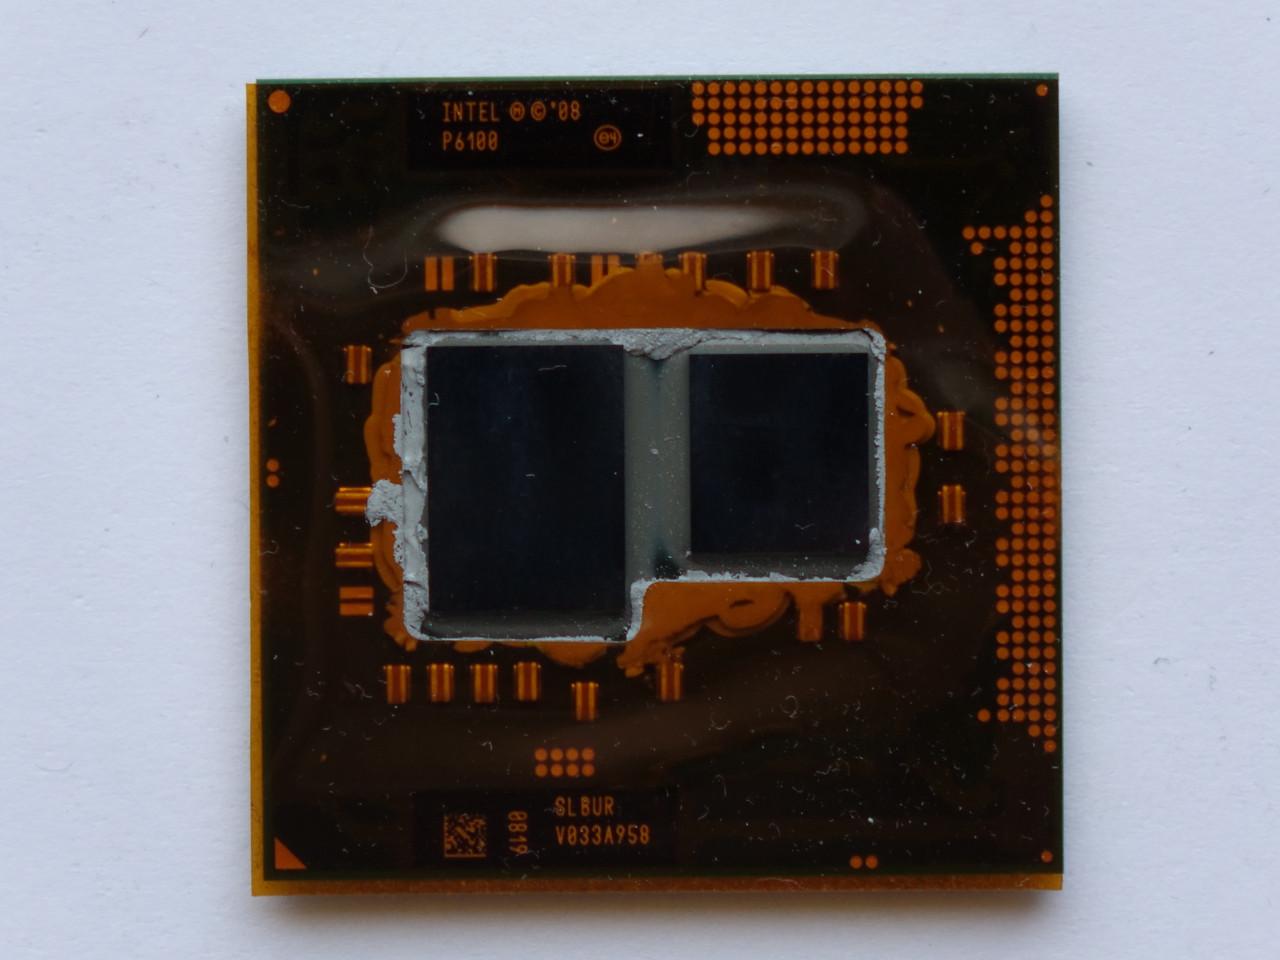 Процессор Intel Pentium P6100 2GHz, 35W, БУ